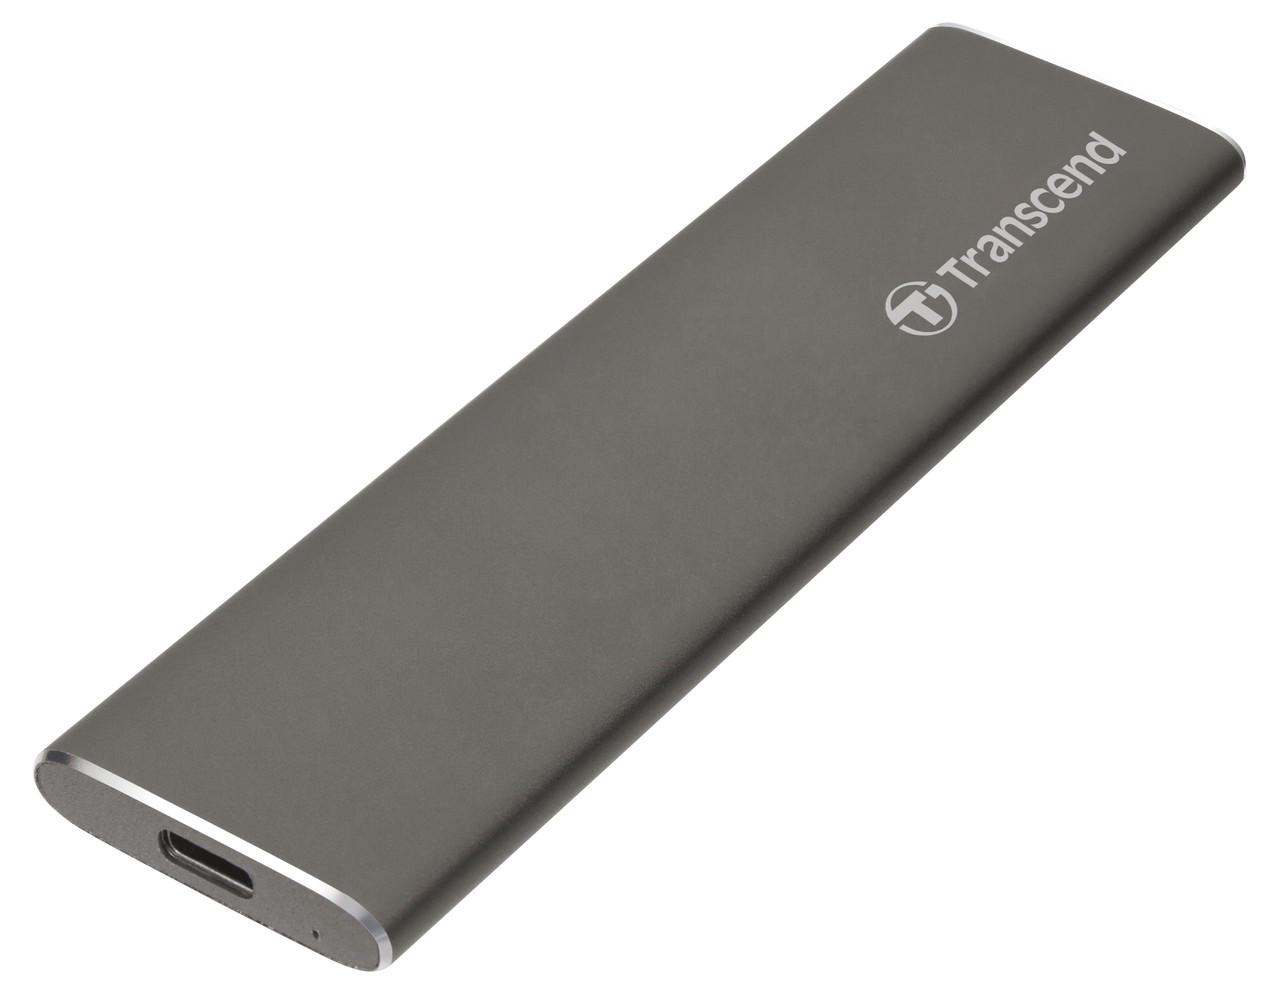 Жесткий диск SSD внешний 240GB Transcend TS240GSJM600 Type C for Mac